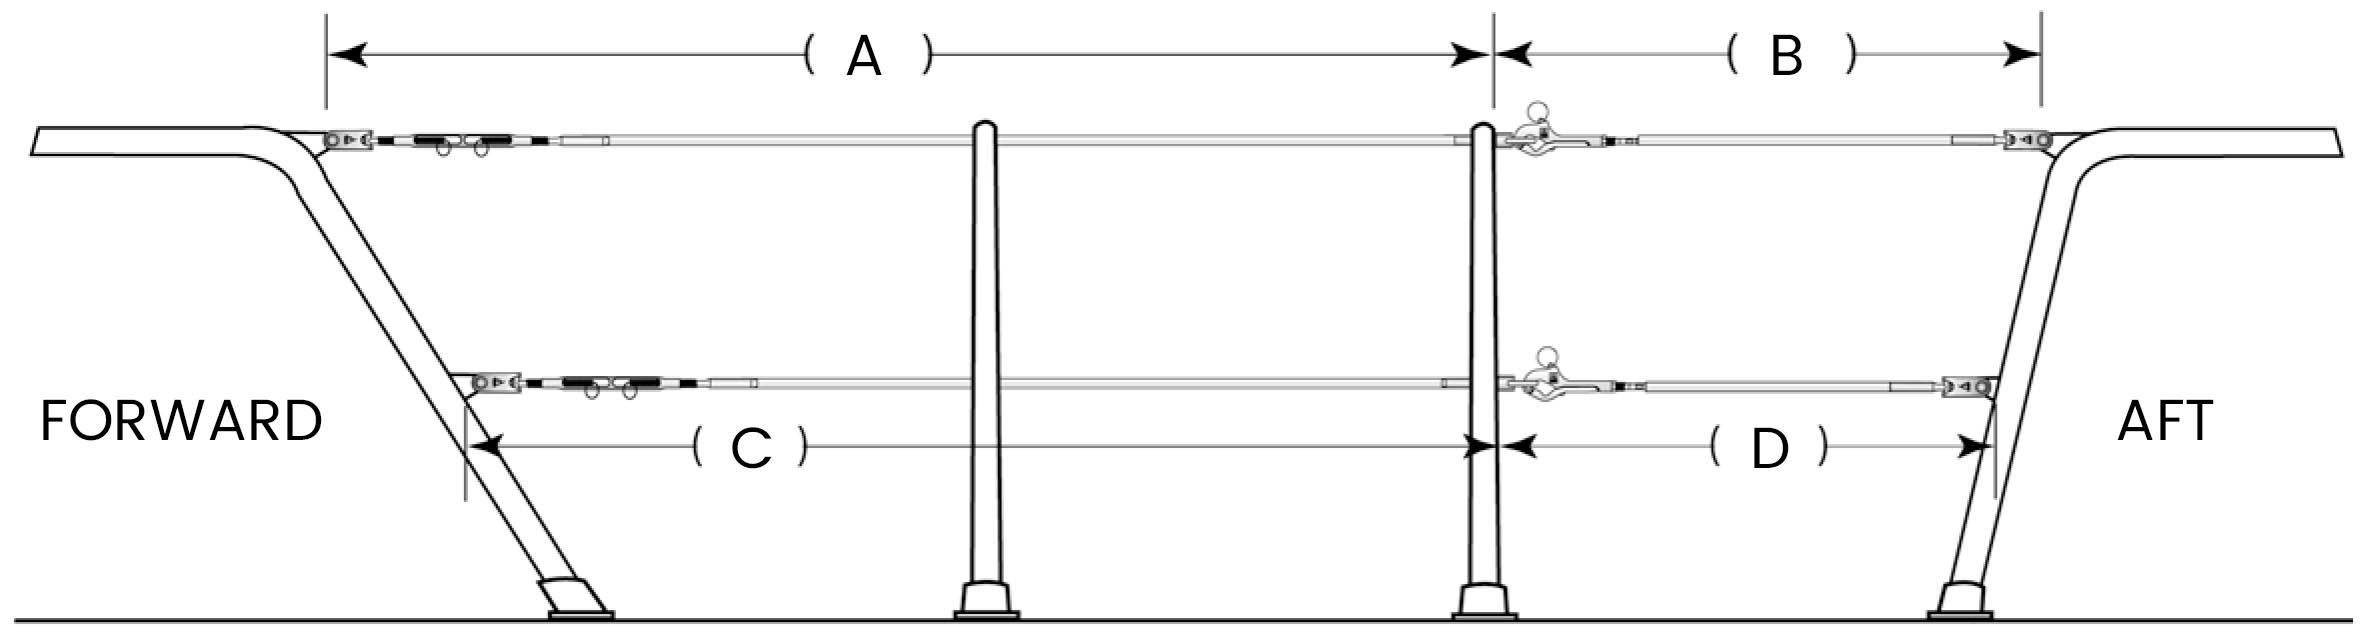 Sailboat Measurement Form - Aft Gate